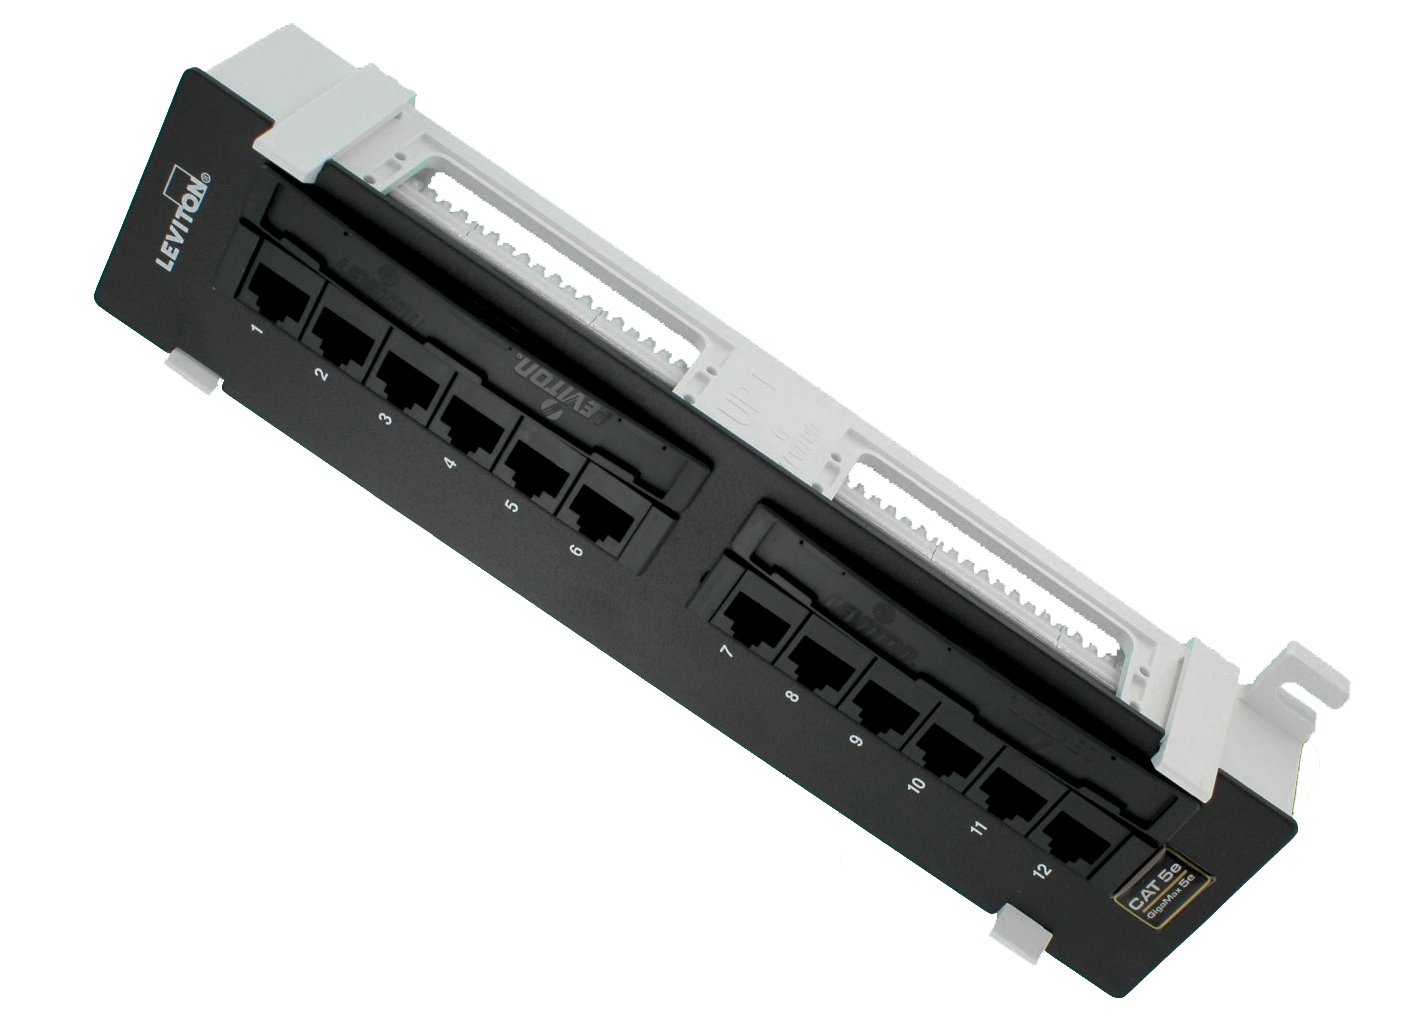 Leviton 5g596 U89 Gigamax 5e Universal 12 Port Patch Wiring Block Cat 100 Inchh X 23 Inchw Home Improvement